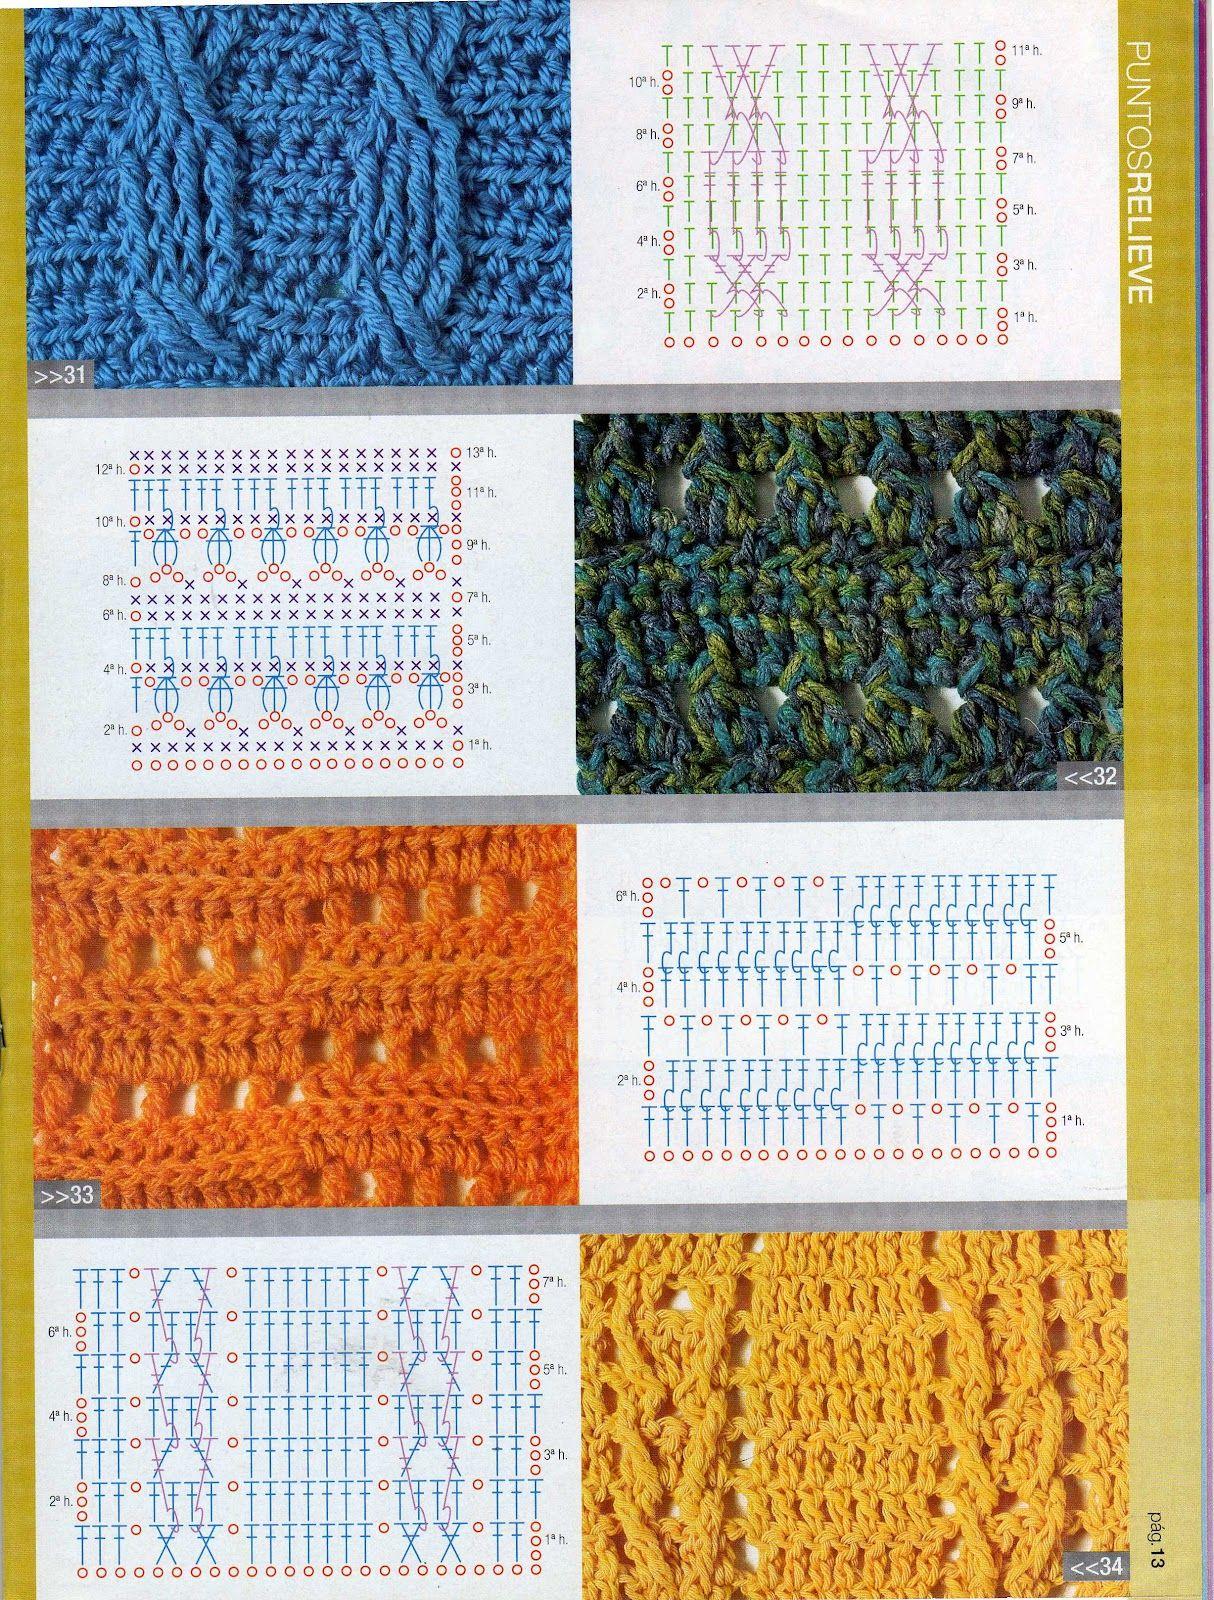 Crochet Stitch Diagram Cool Crochet Knit Pinterest